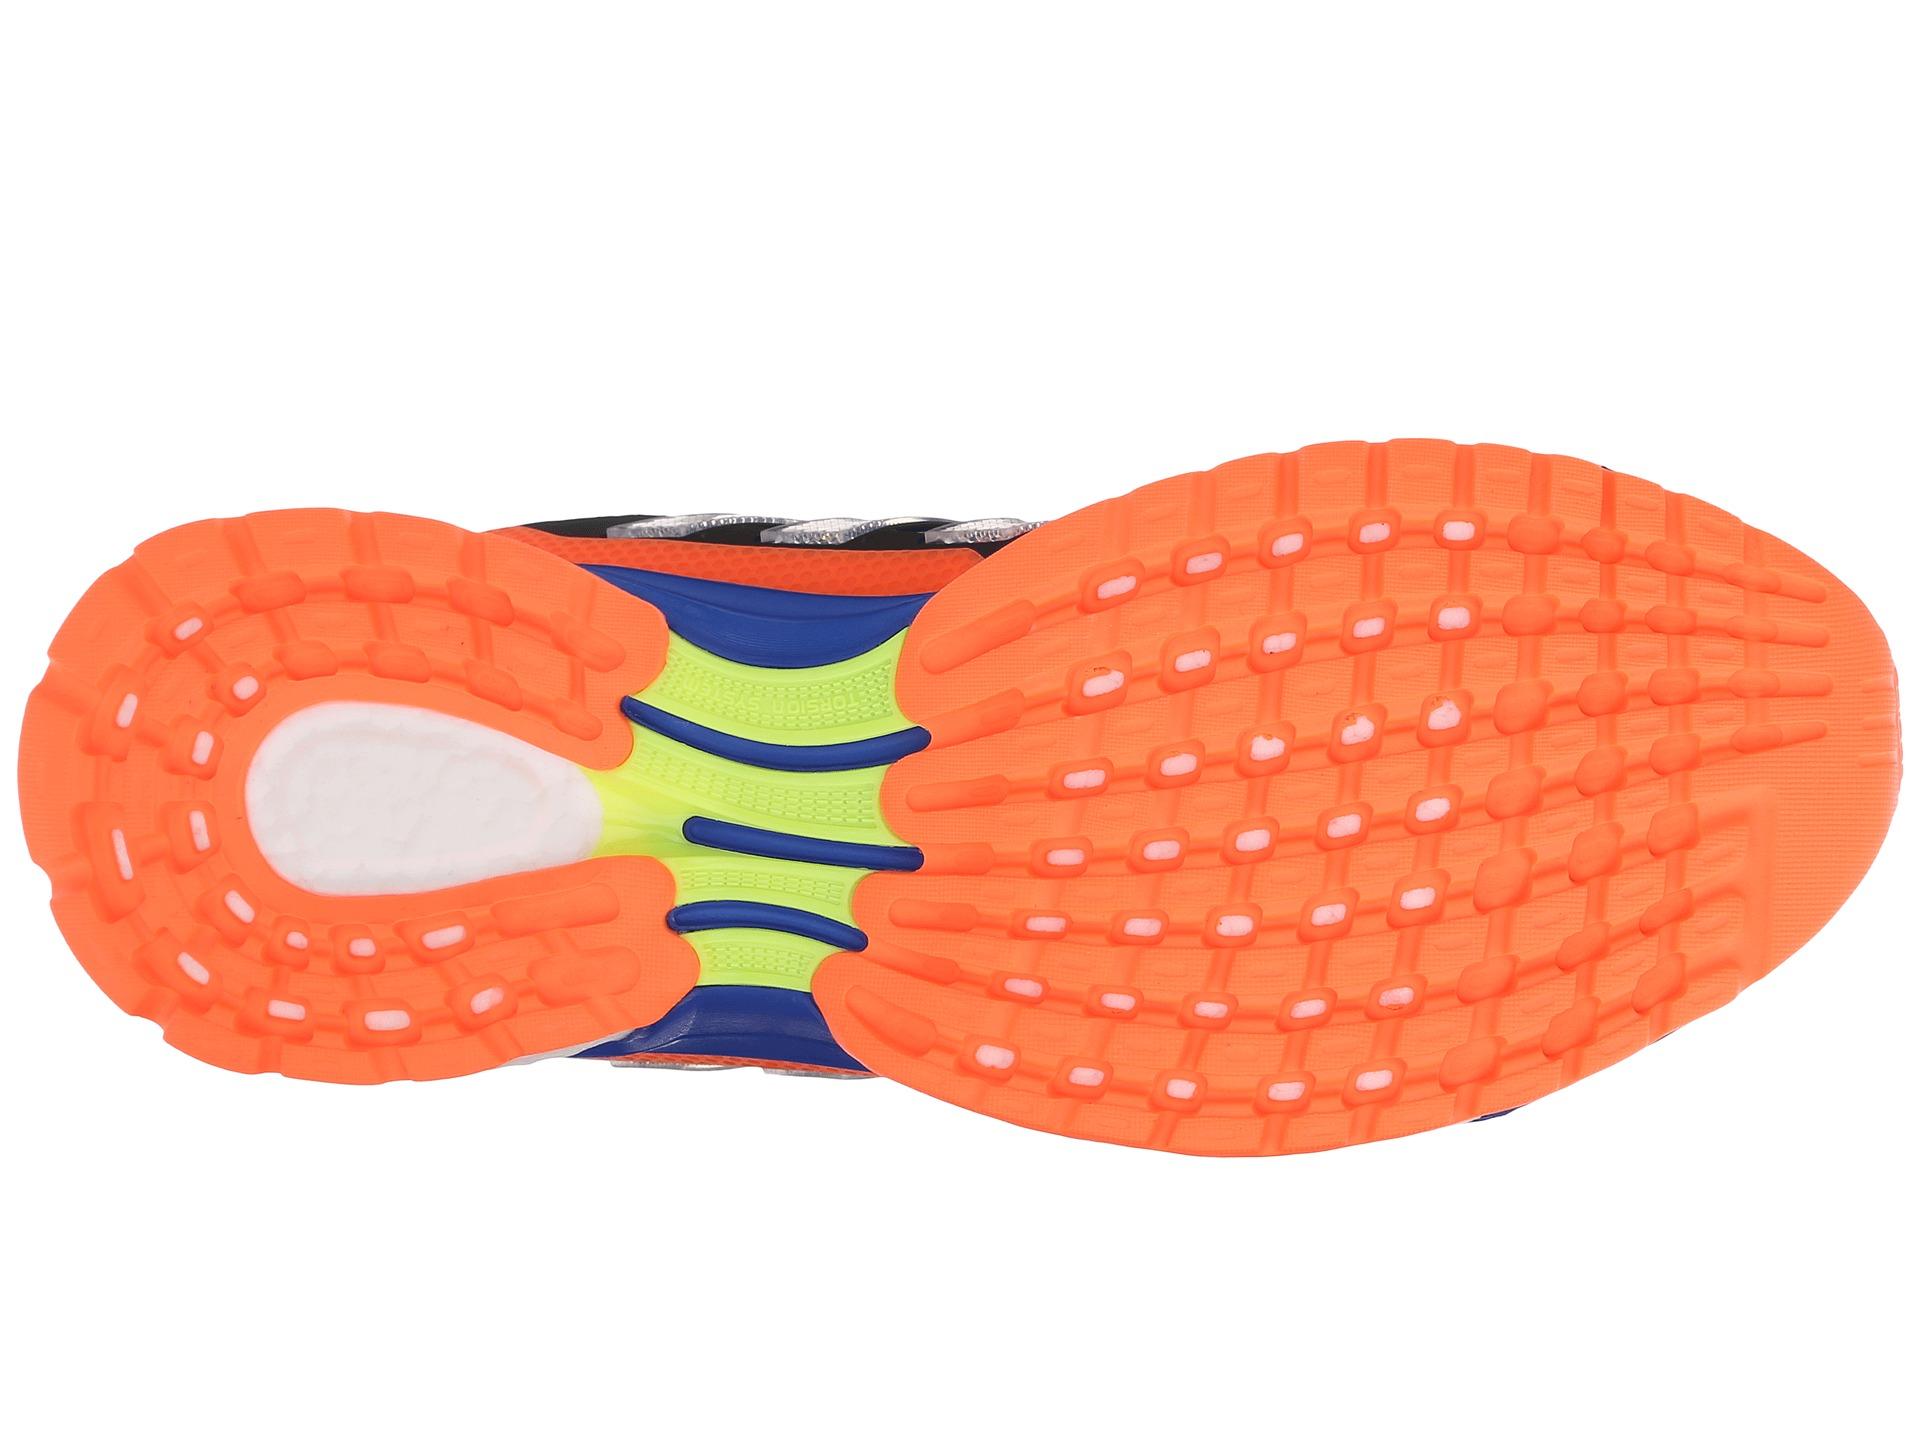 Adidas Running Response Boost 2 Techfit Dark GreyBlack